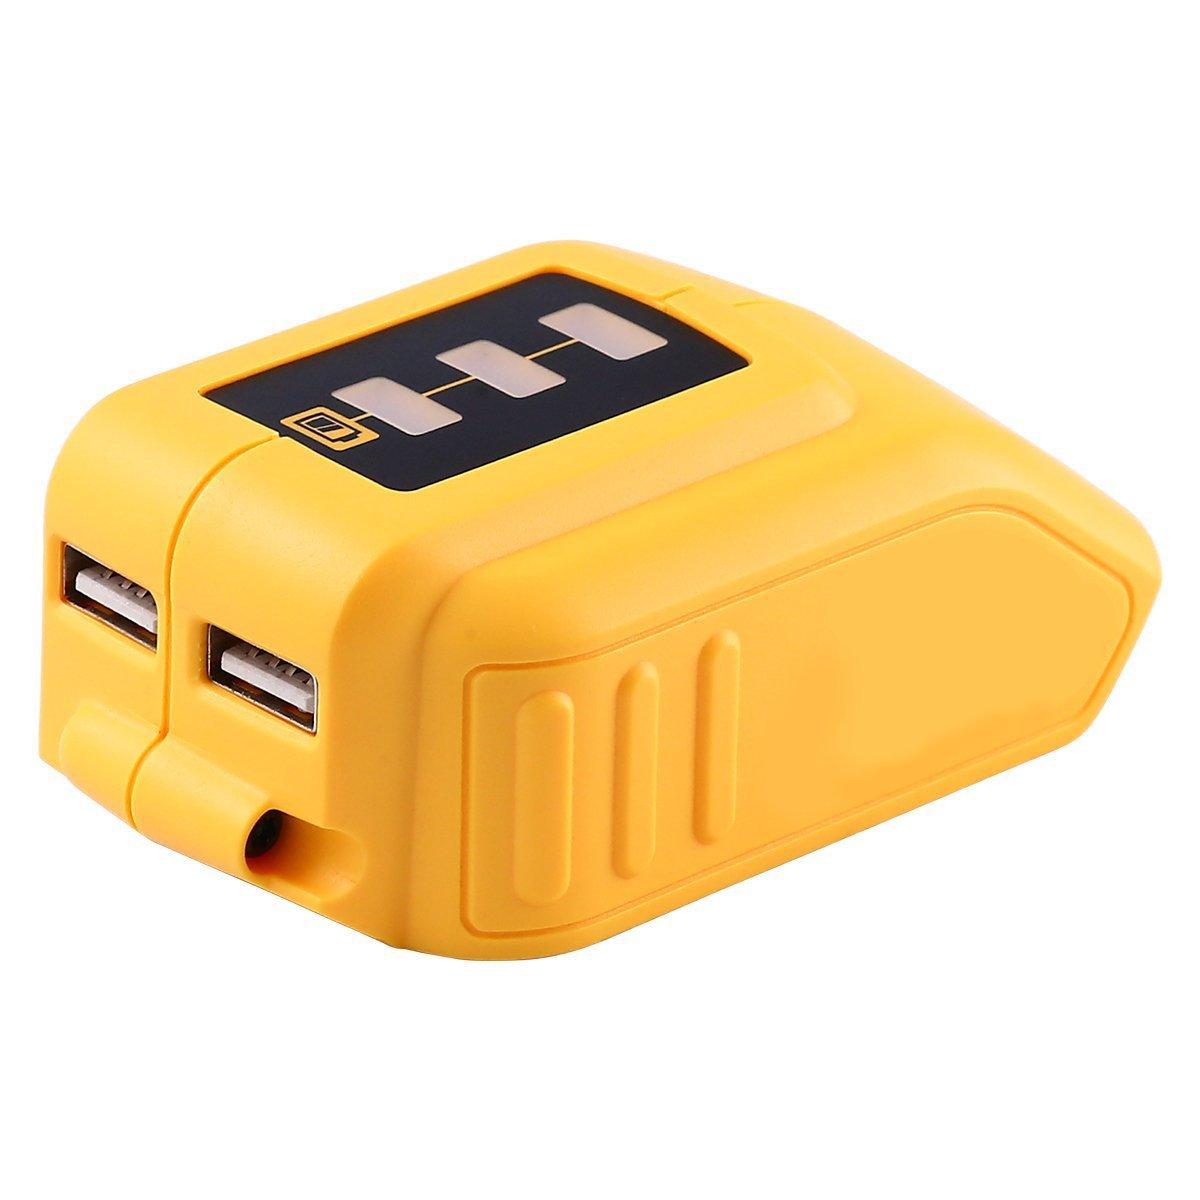 Reoben Akku-Adapter mit USB Anschluss DCB090 fü r Dewalt 10, 8V / 14, 4V / 18V Lithium-Ionen-Akku